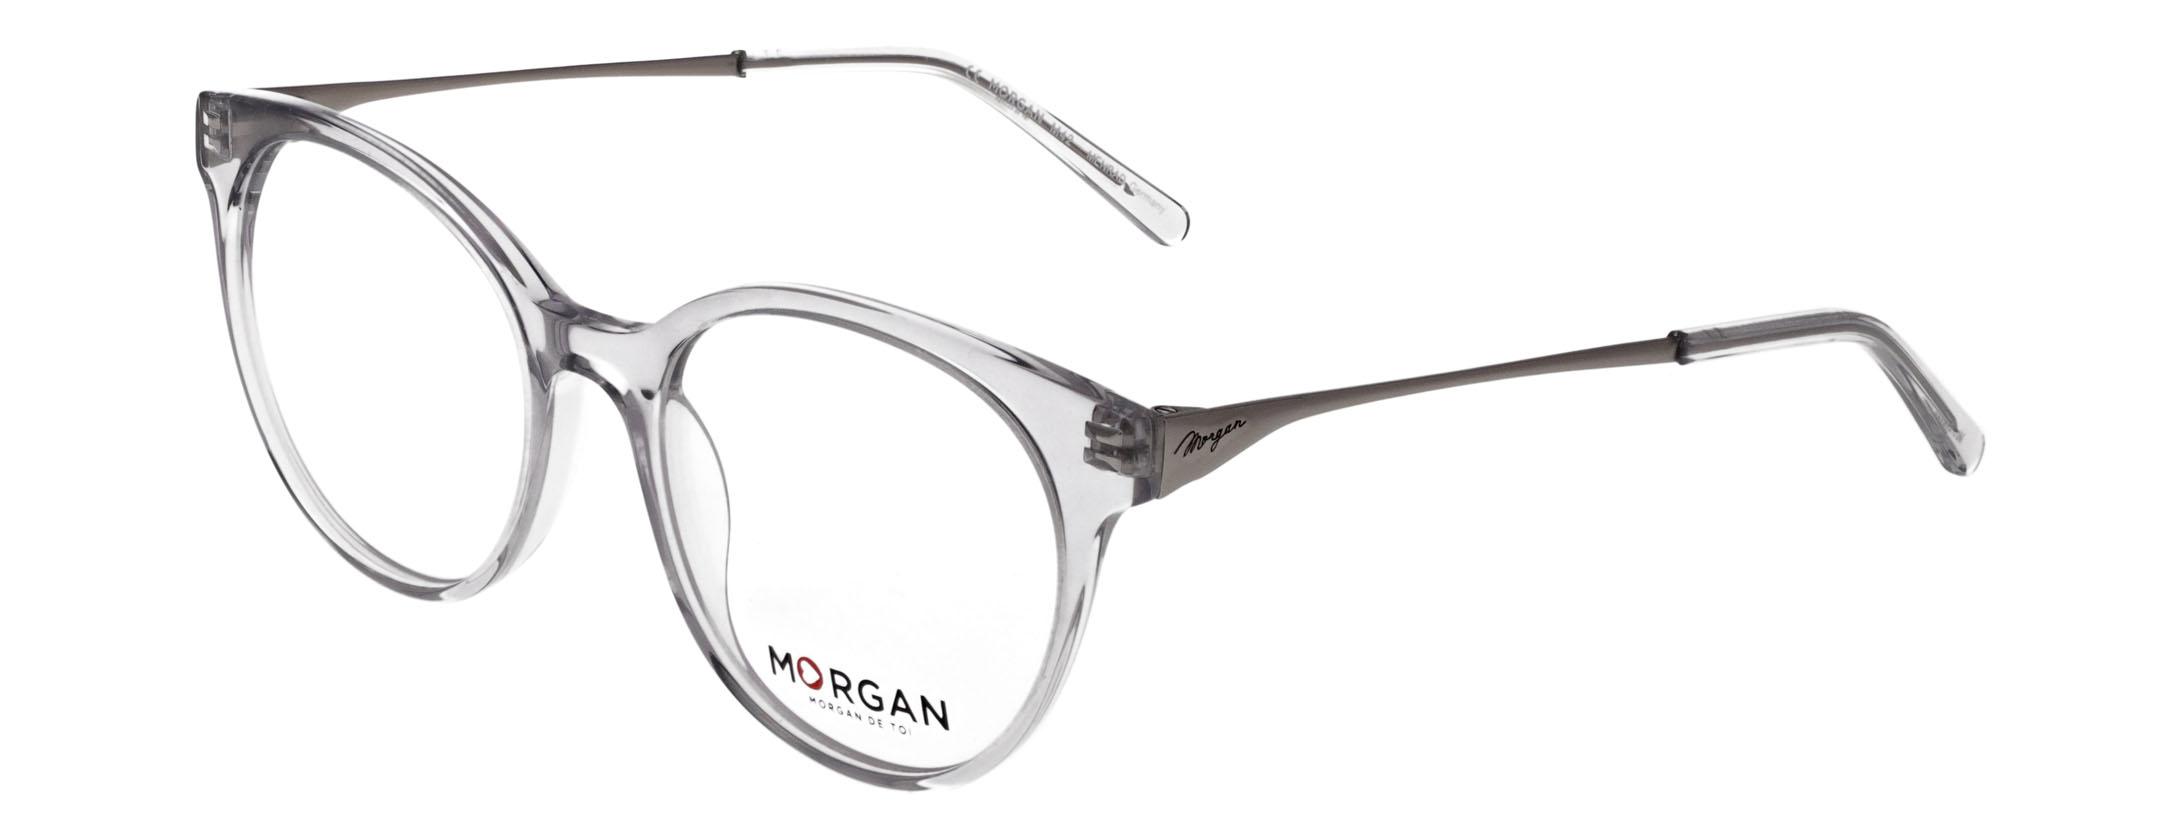 Morgan 202026 6500